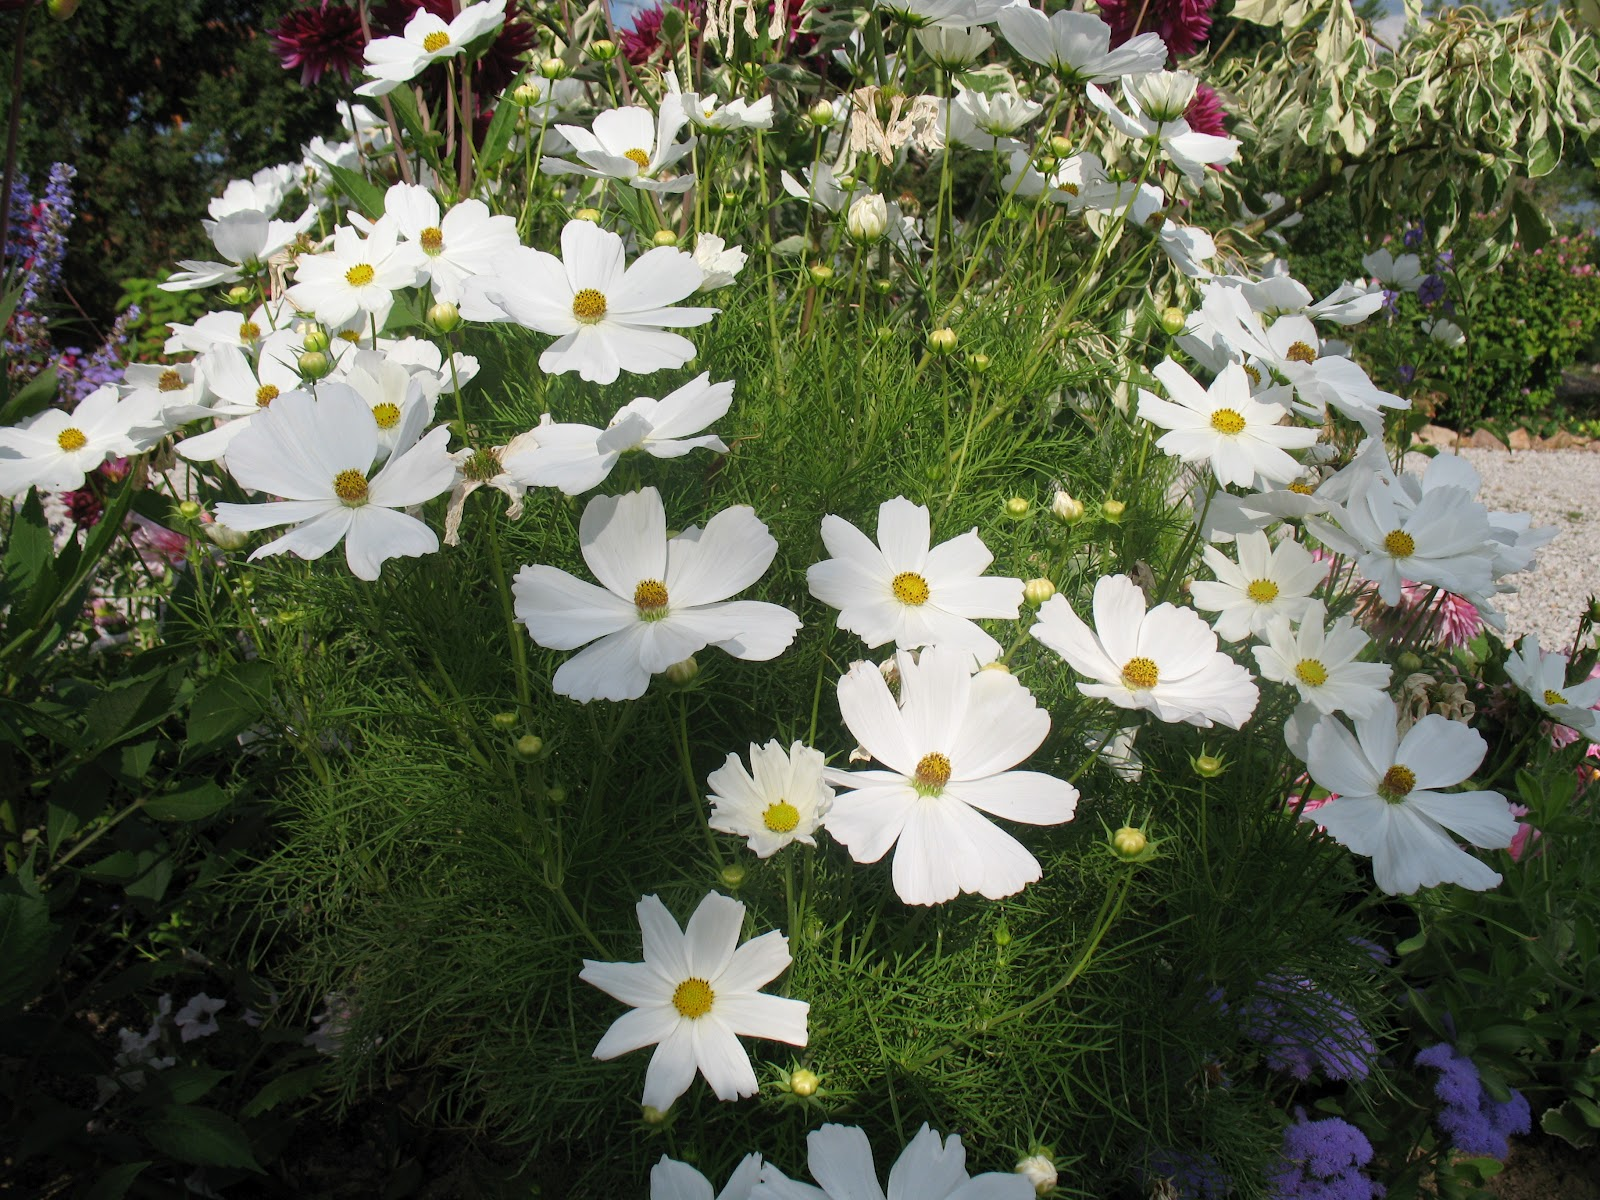 25 graines de cosmos blanc cosmos bipinnatus white x136 seeds samen semillas ebay. Black Bedroom Furniture Sets. Home Design Ideas